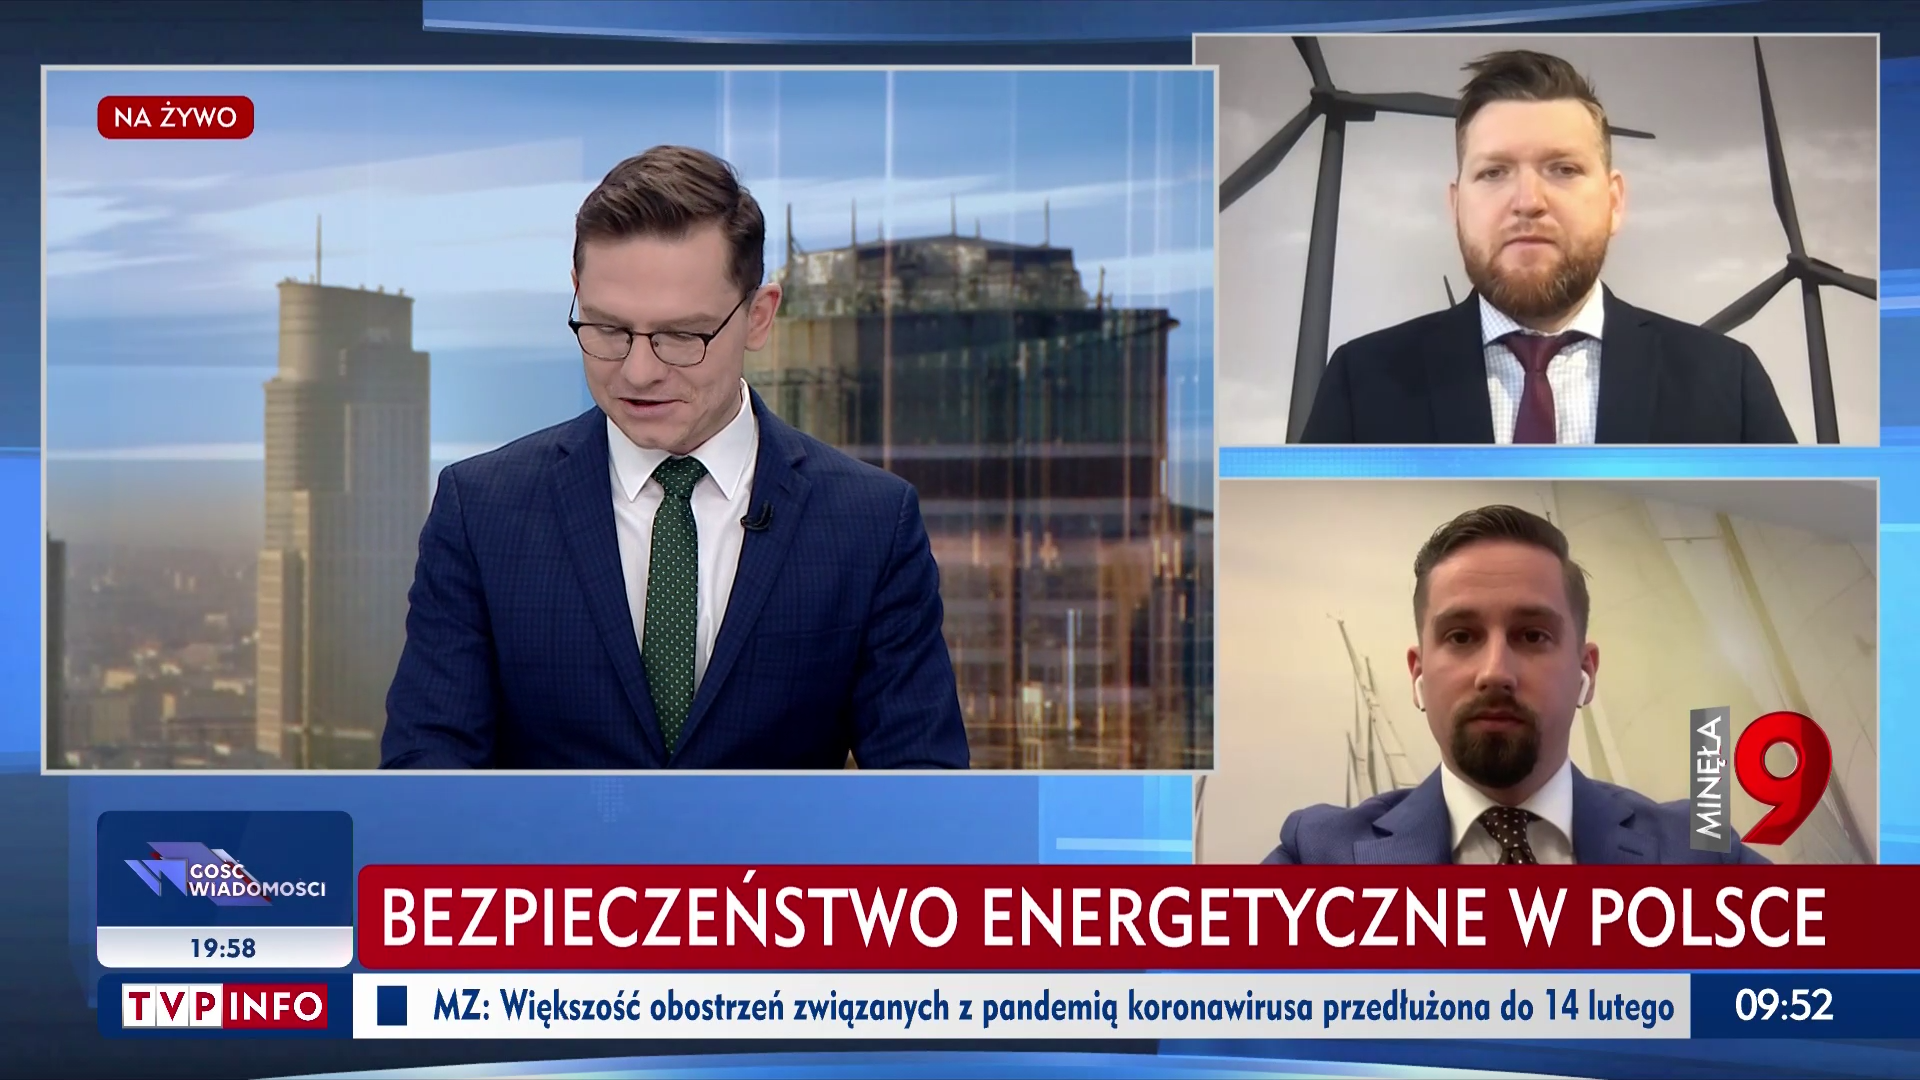 J.Sakławski Minęła 9 TVP Info_offshore